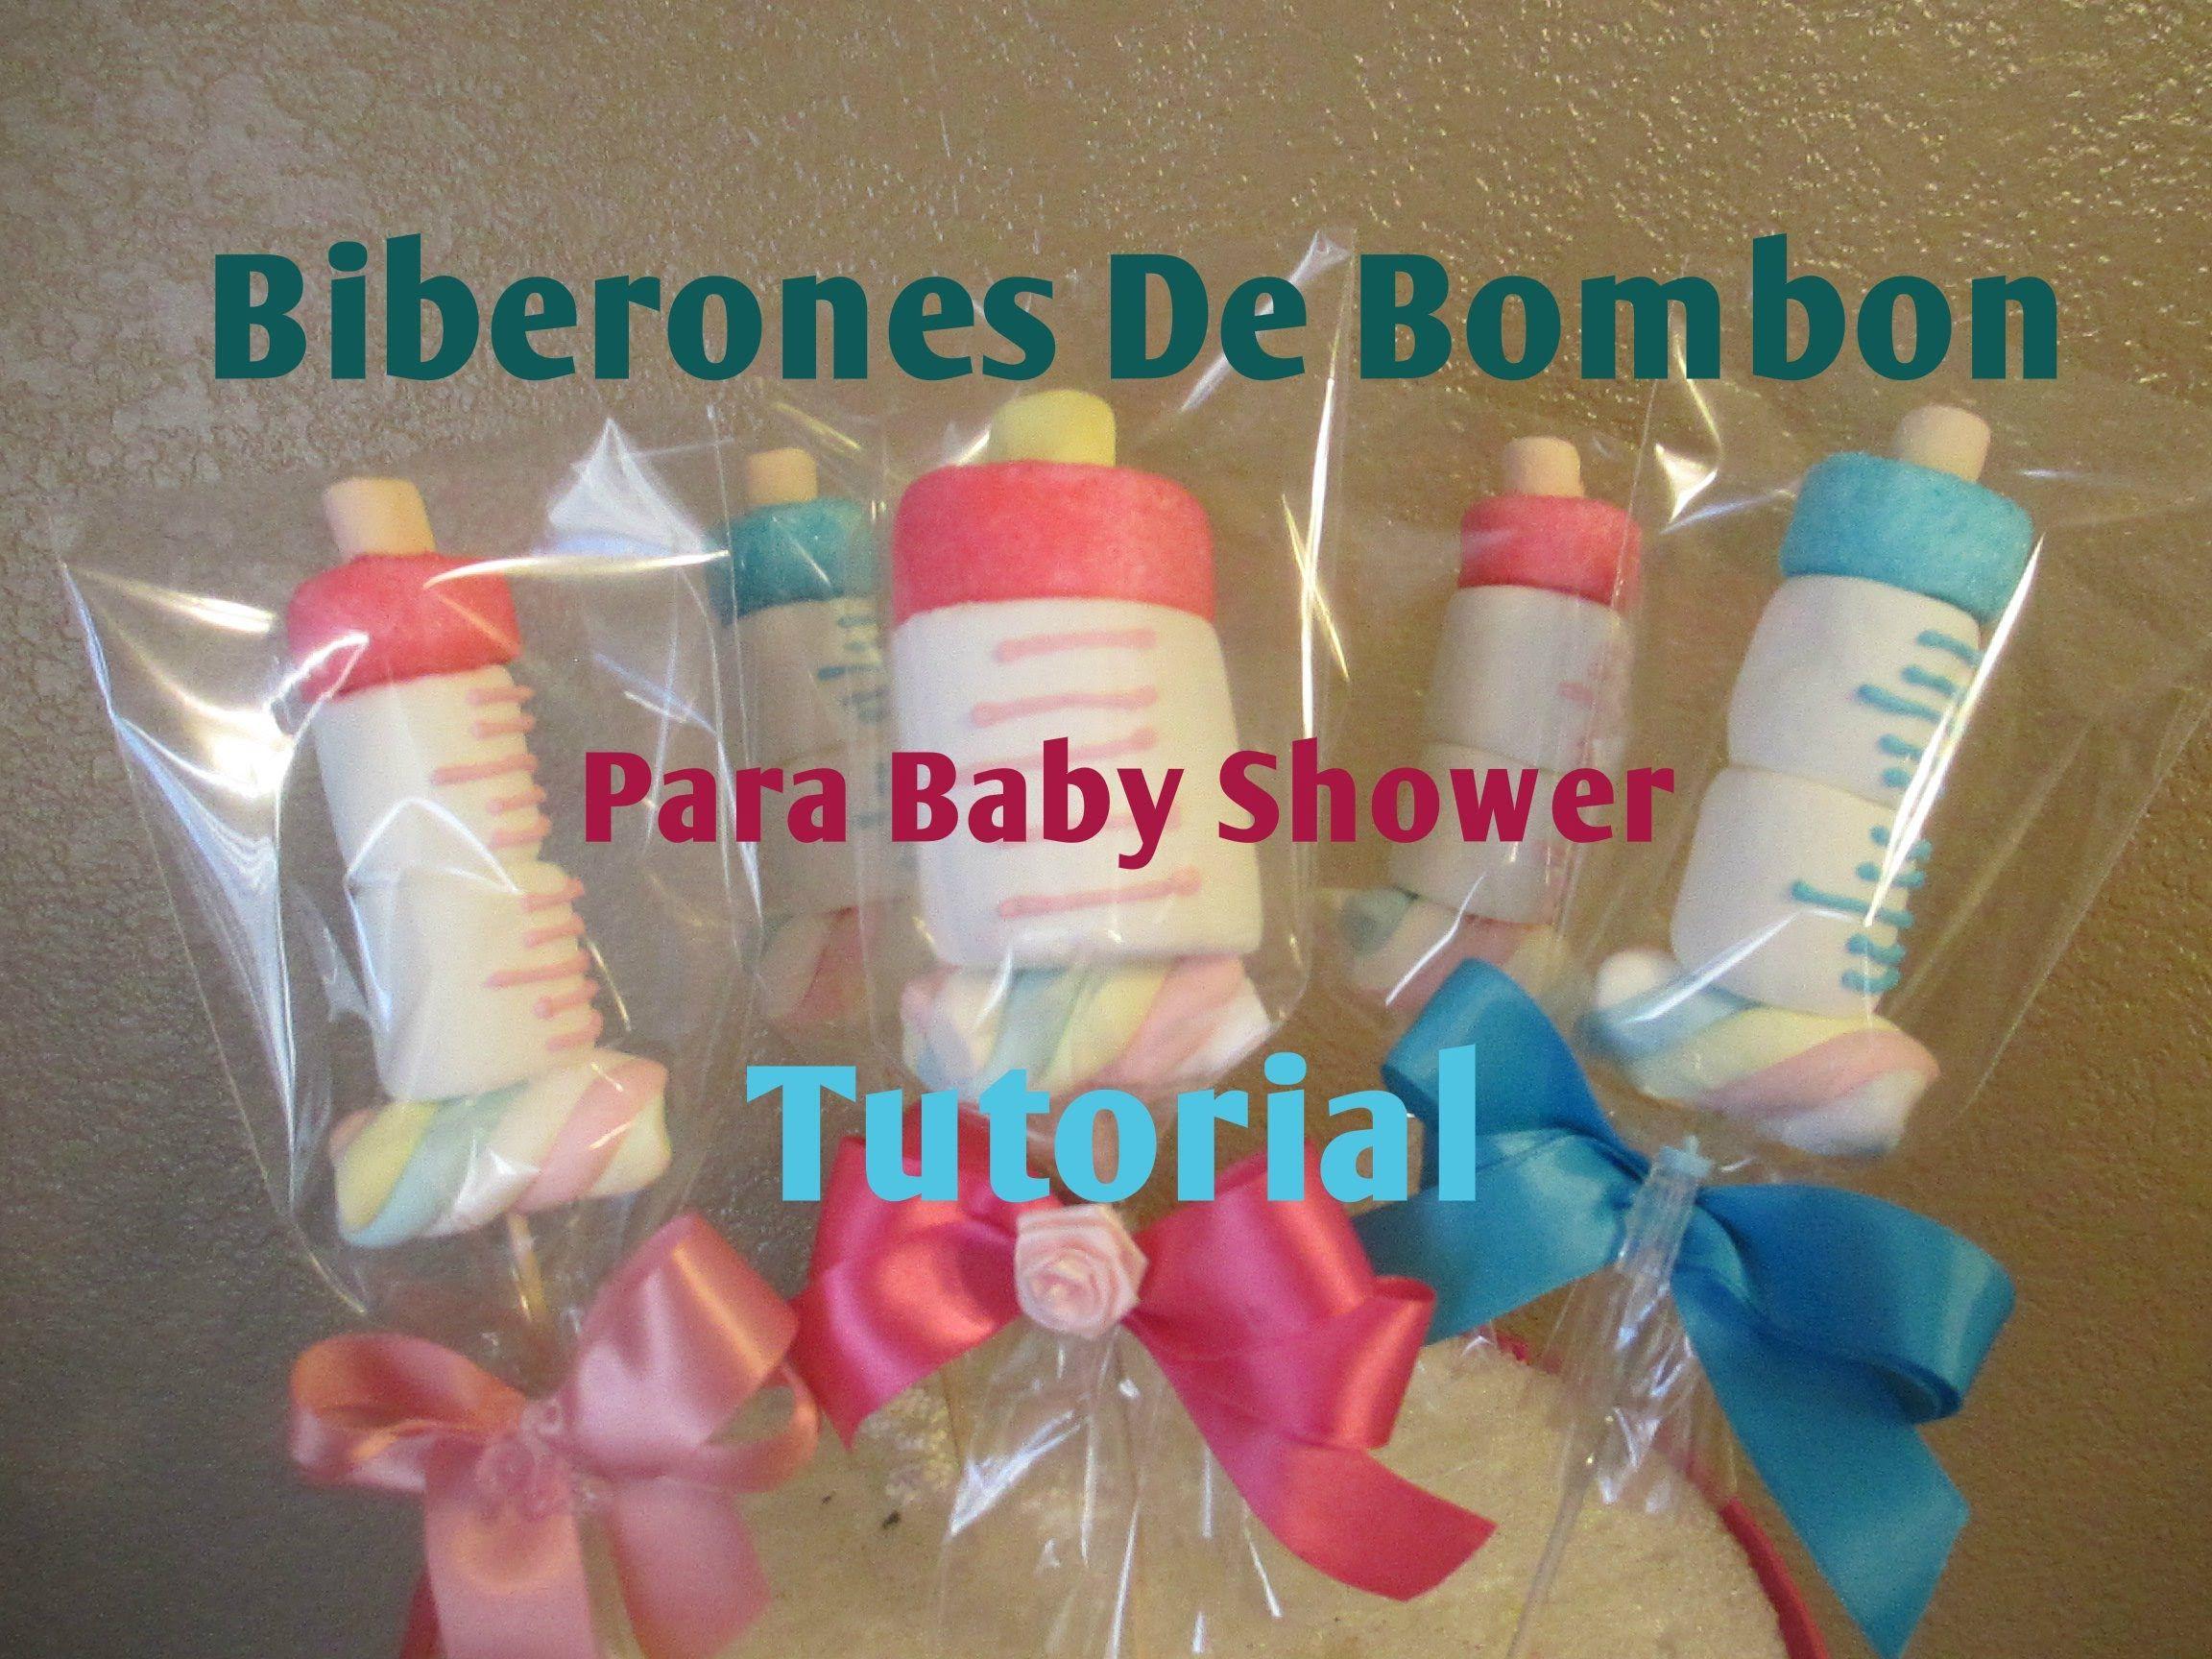 Mamila biberon en bombon para baby shower muy facil 2 - Ideas para baby shower de nino ...